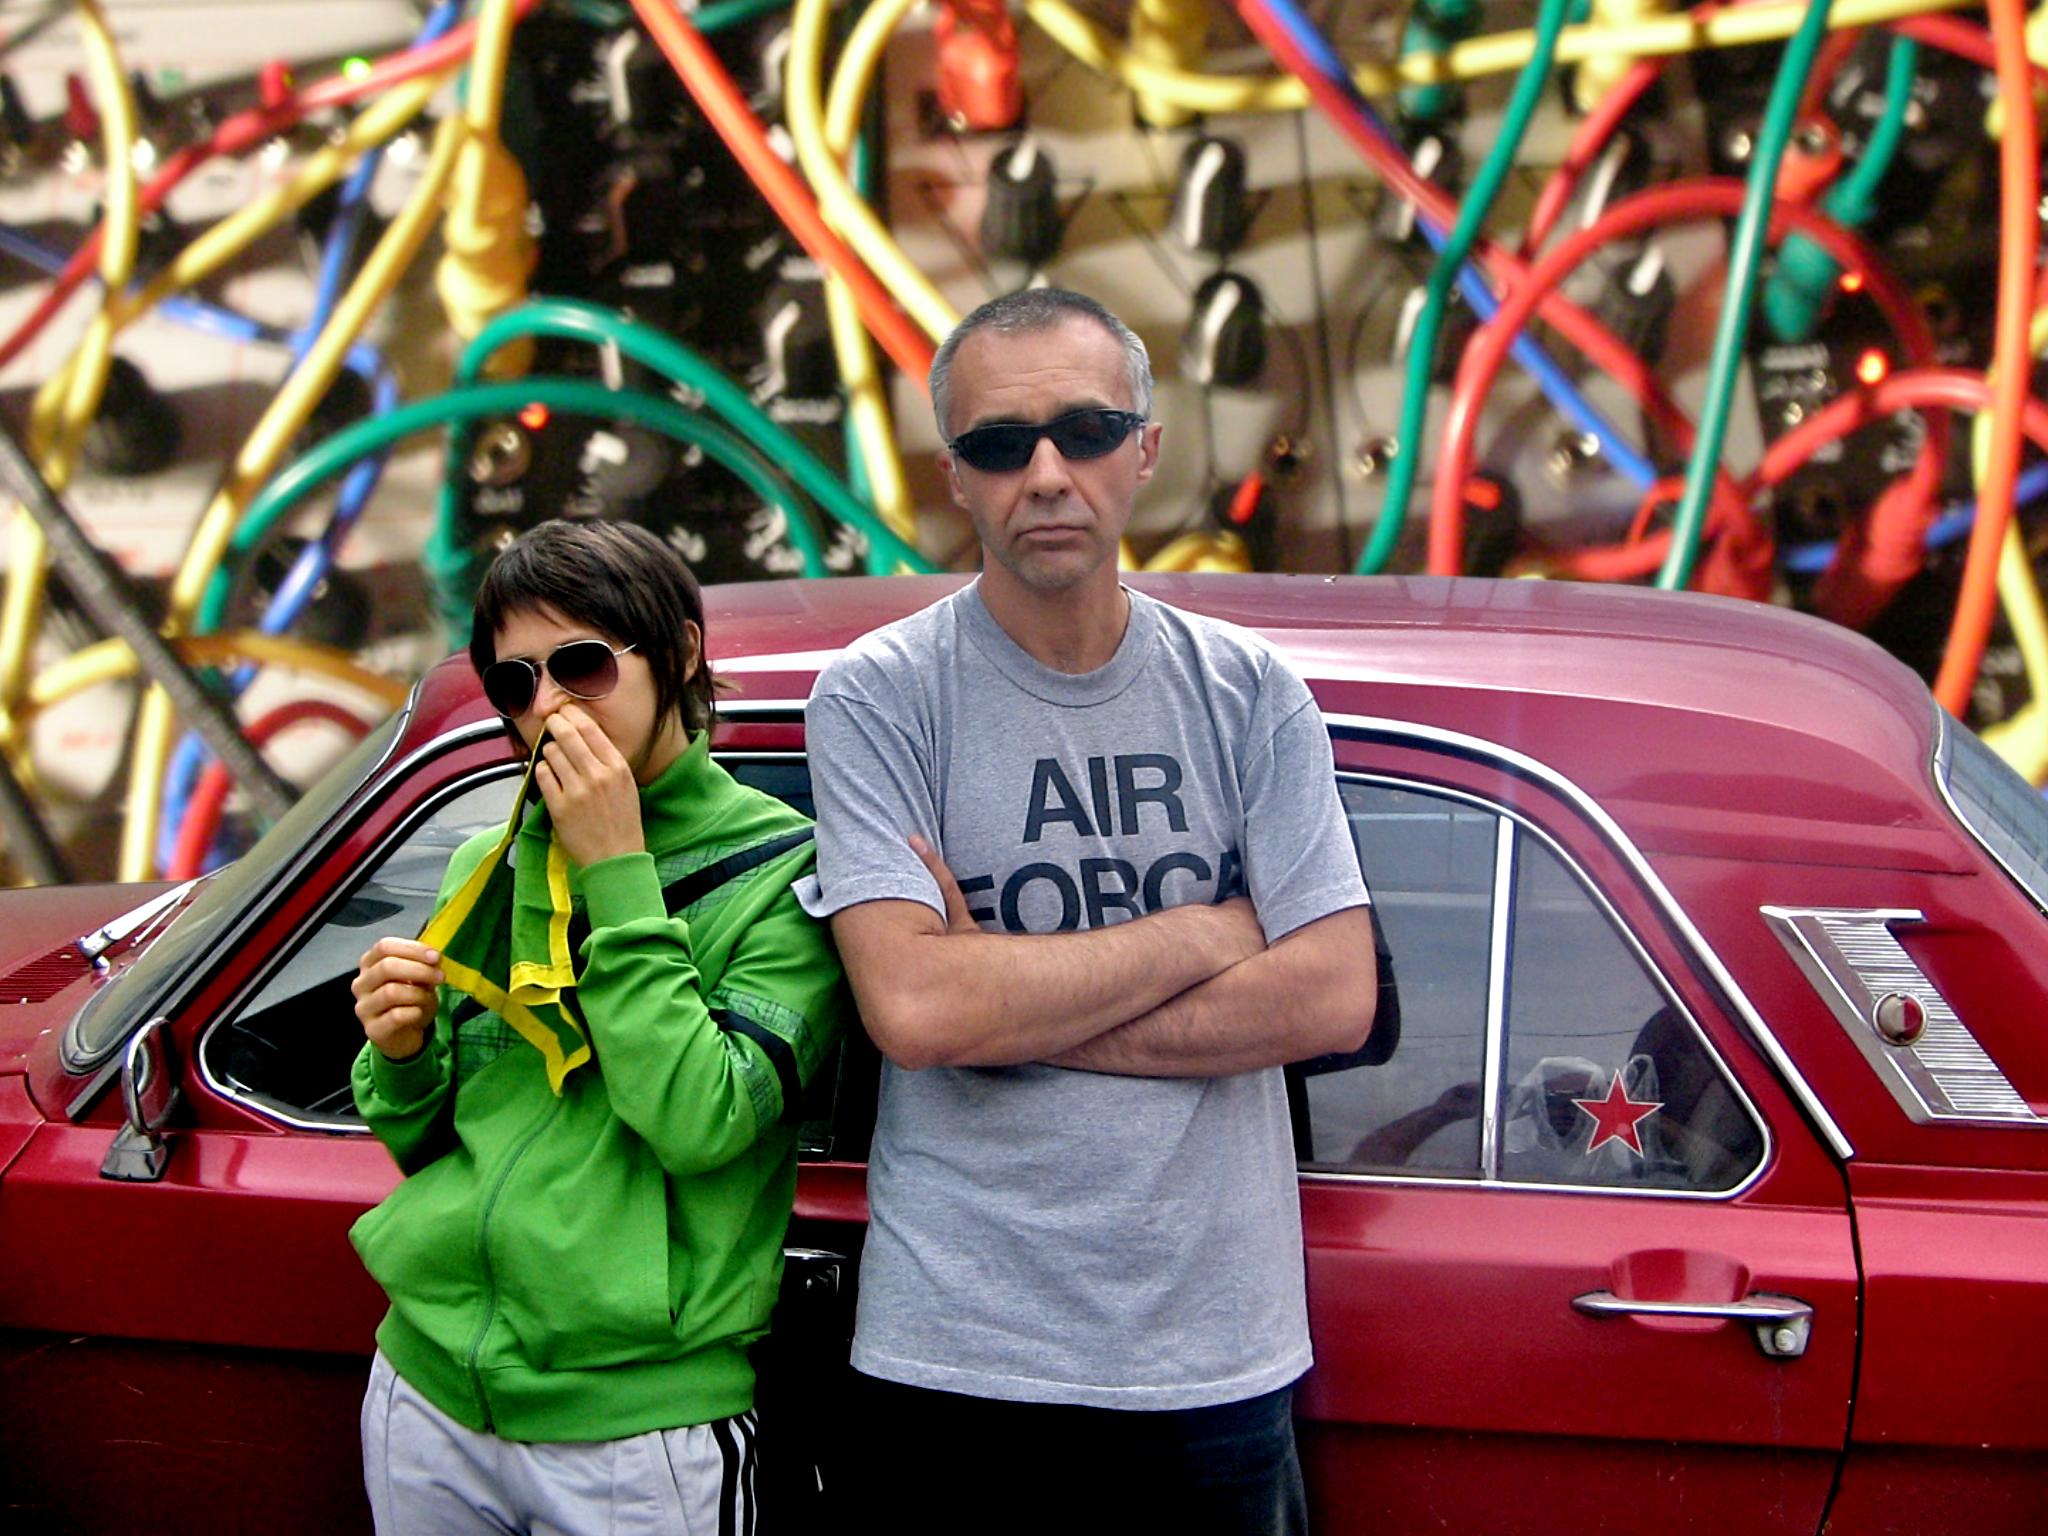 ASTMA: Алексей Борисов и Ольга Носова. Фото: Karry Sarkisyan. Коллаж: Maxim Elyzarov.